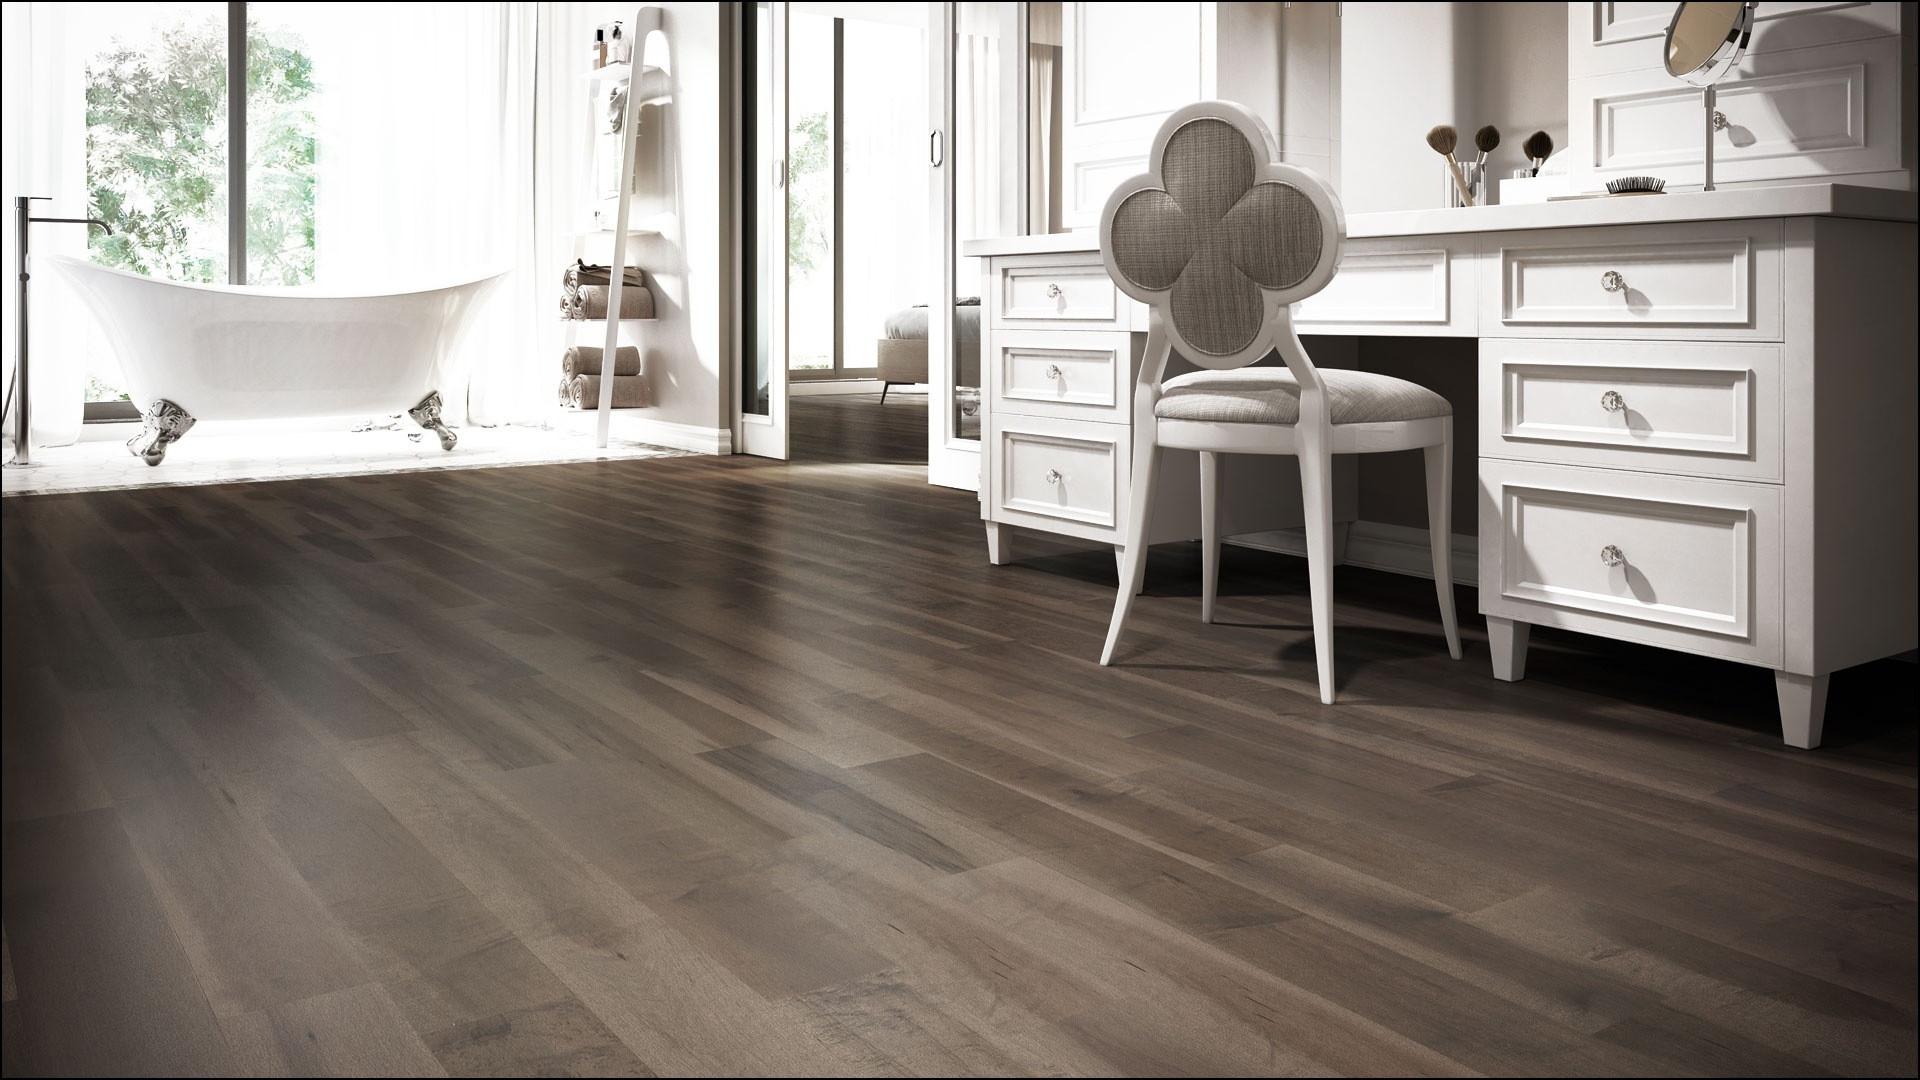 Pecan Hardwood Flooring Reviews Of Hardwood Flooring Suppliers France Flooring Ideas with Hardwood Flooring Pictures In Homes Images Black and White Laminate Flooring Beautiful Splendid Exterior Of Hardwood